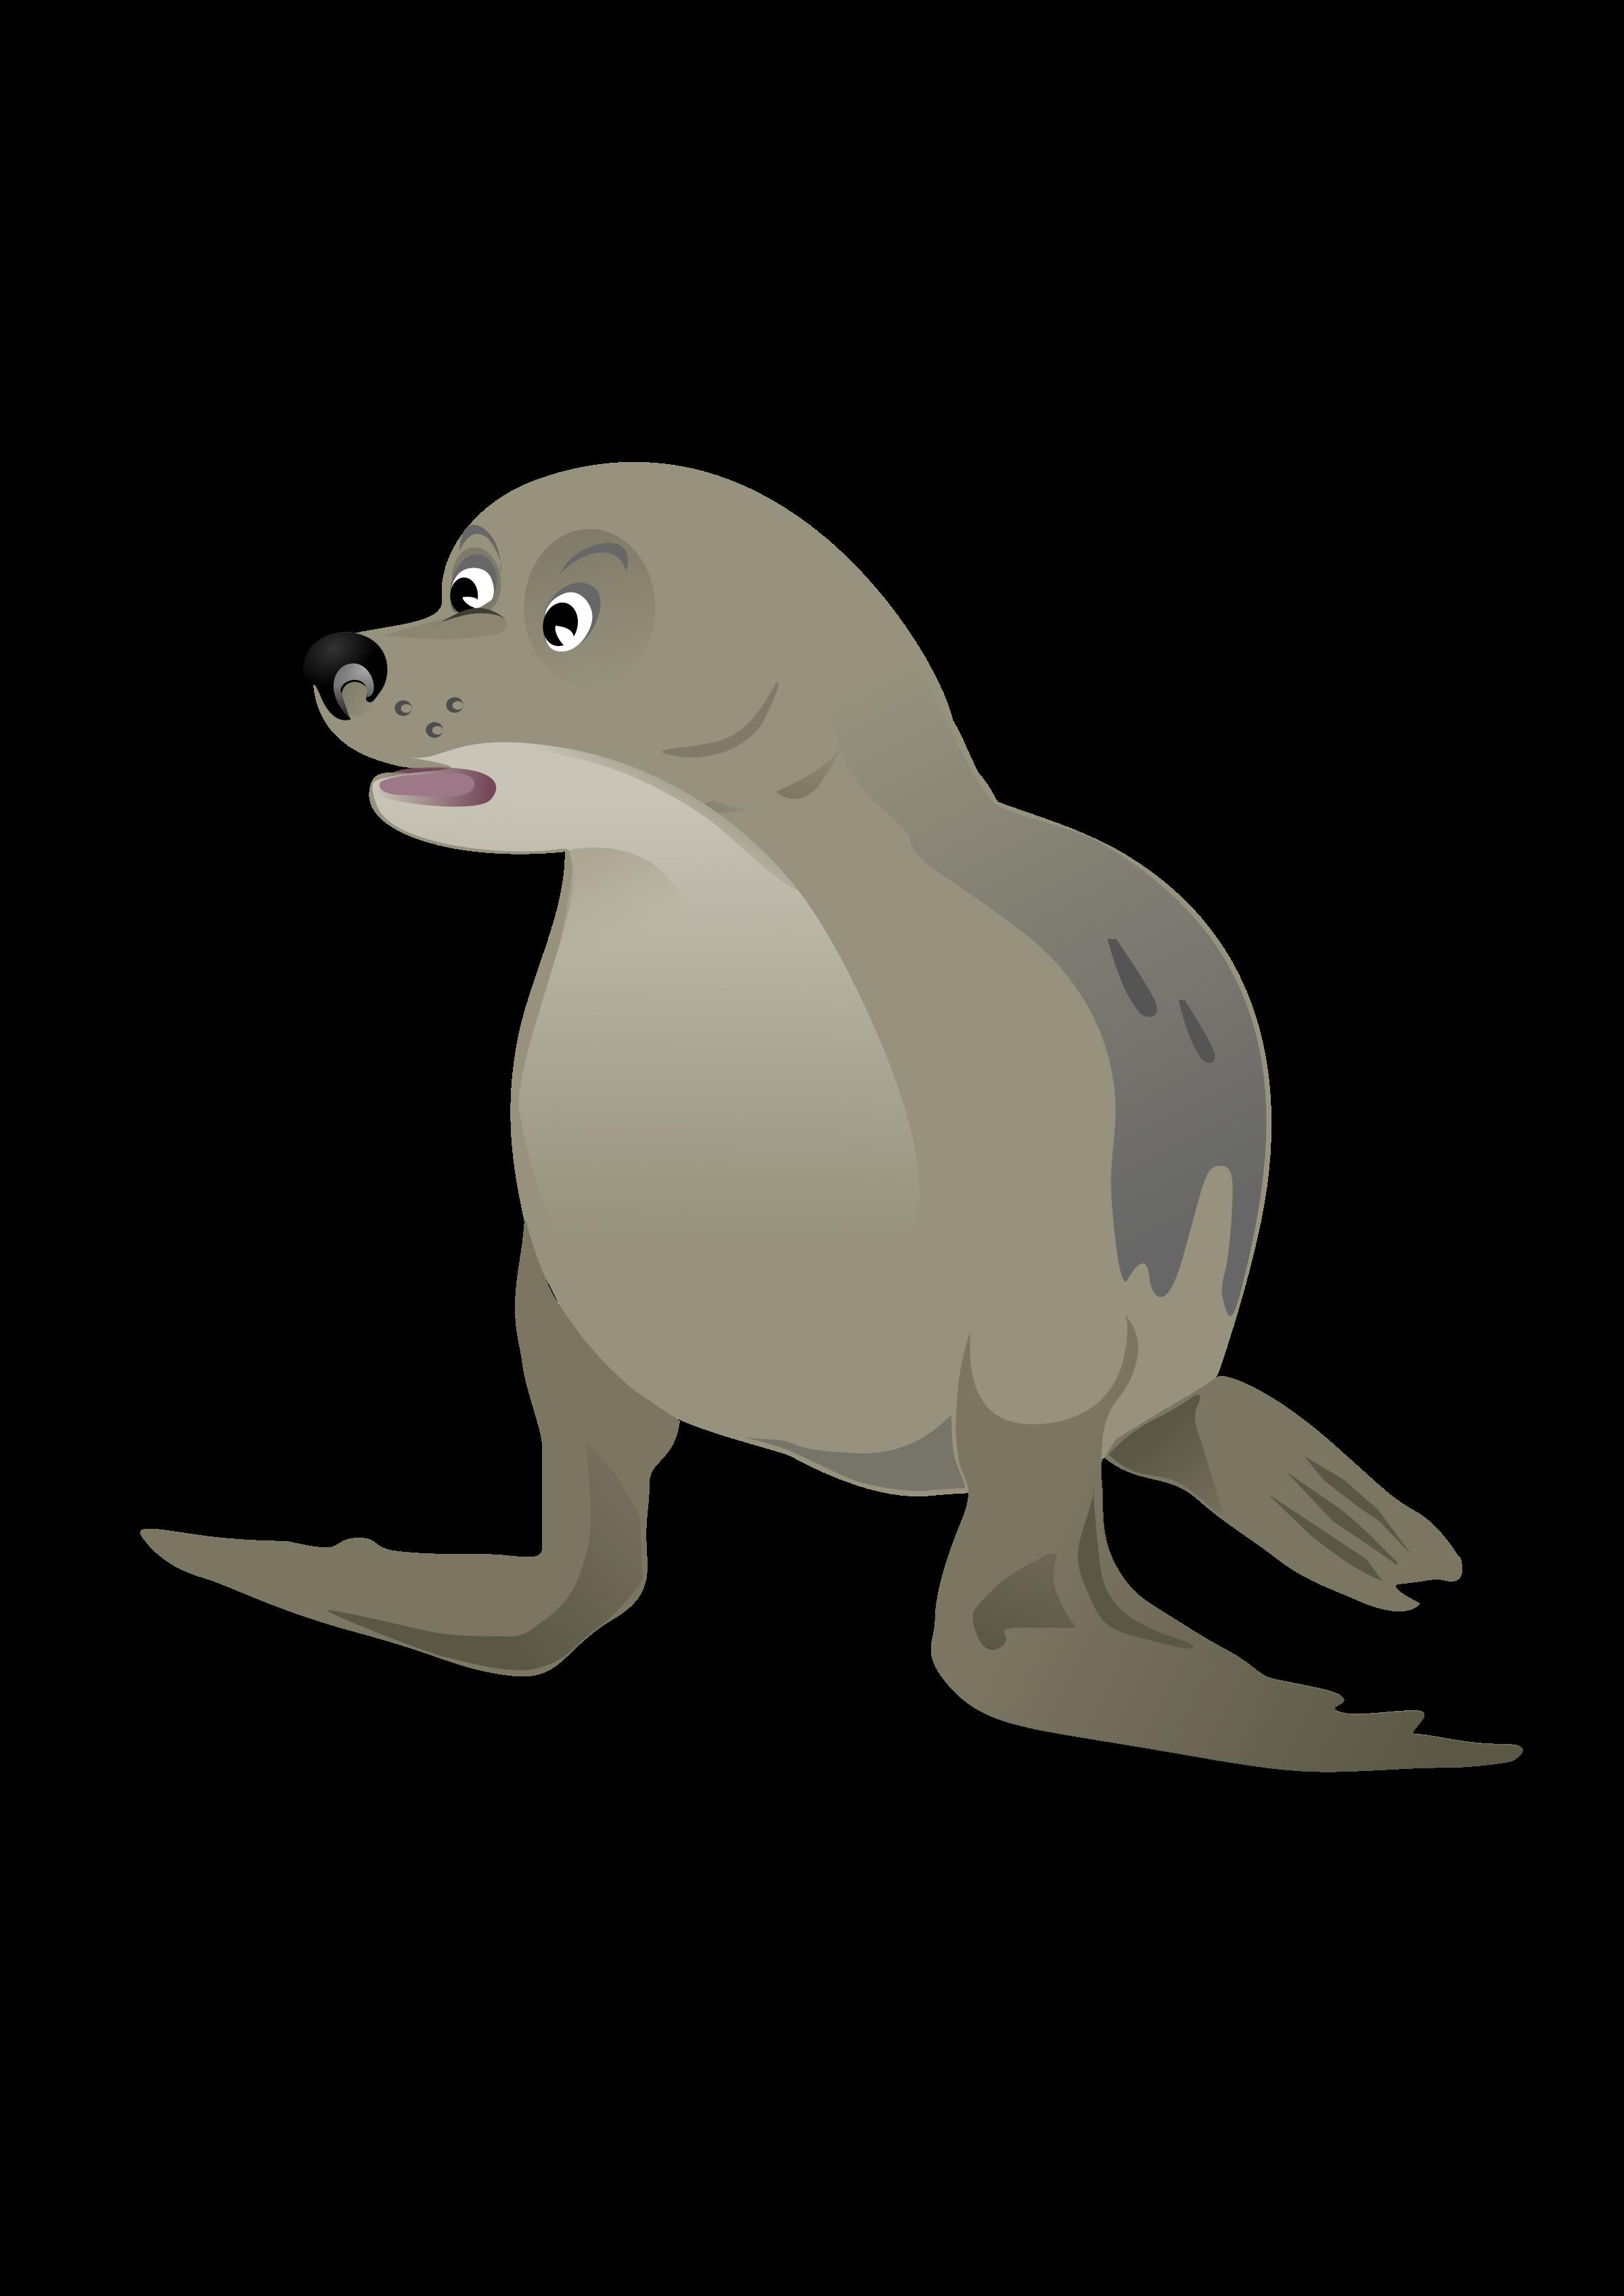 clip art royalty free library Seal big image png. Walrus clipart grey thing